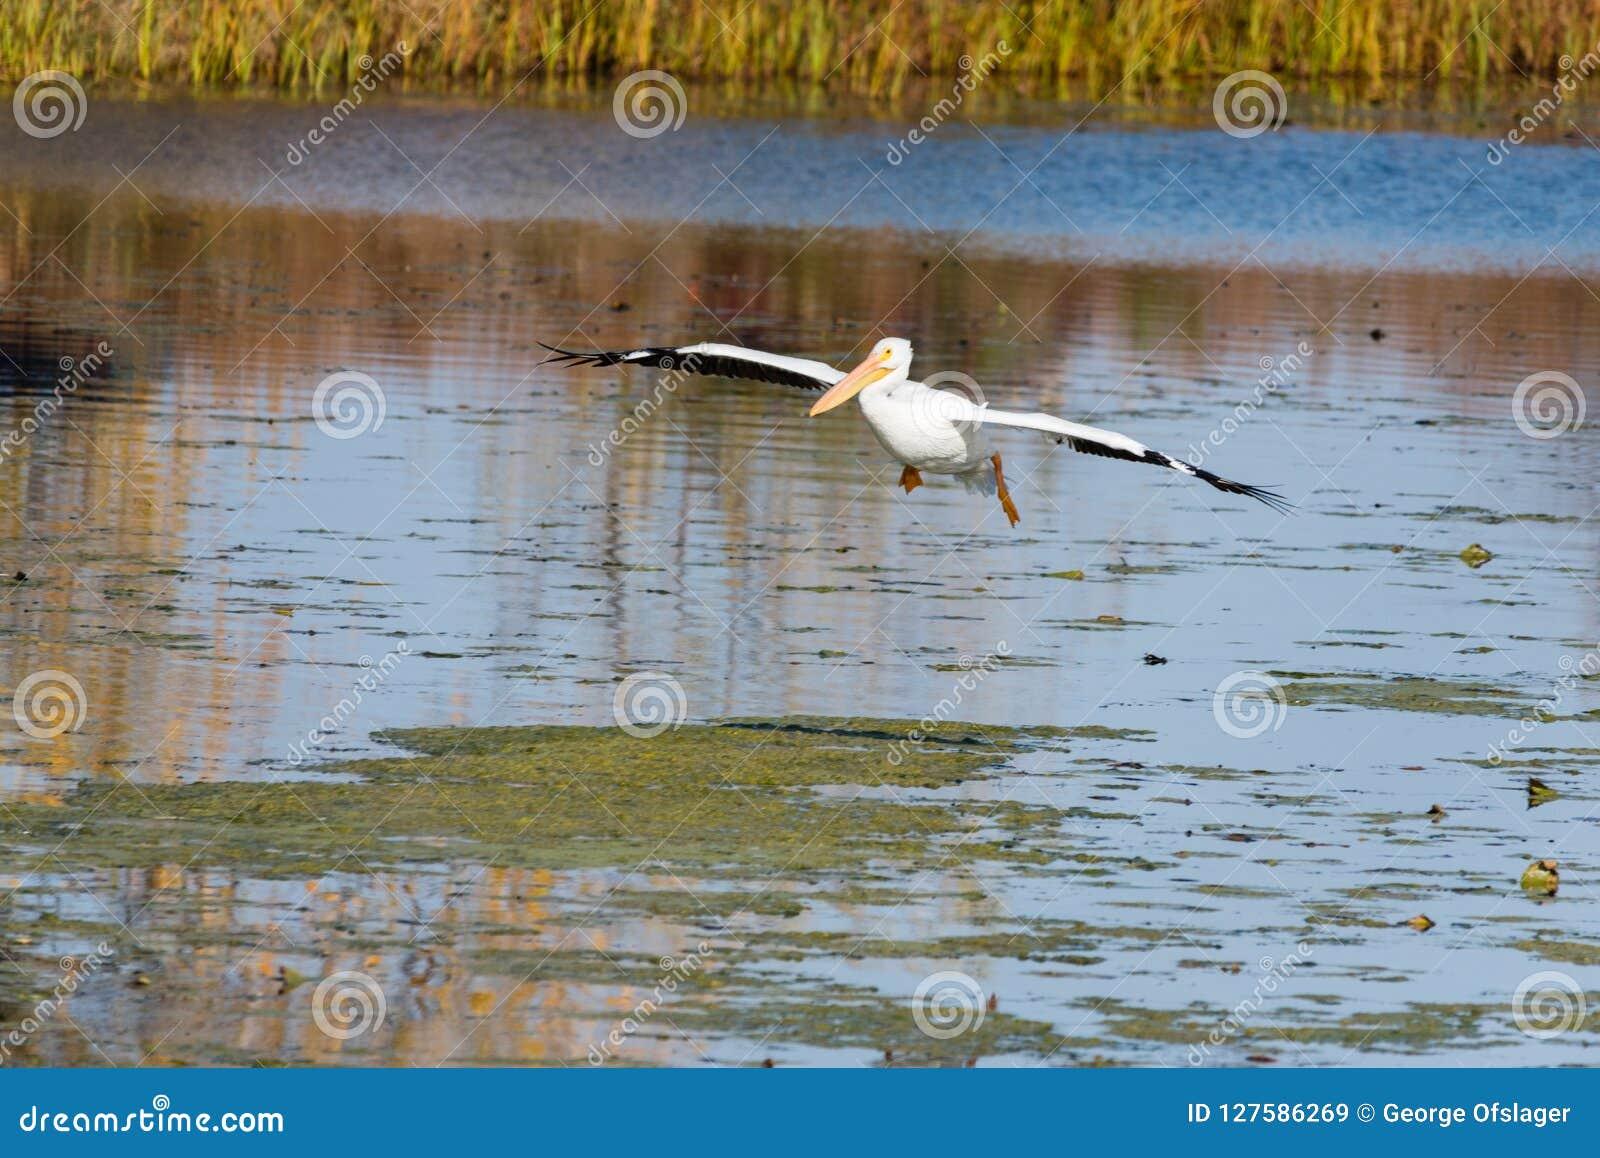 Пеликан посадки